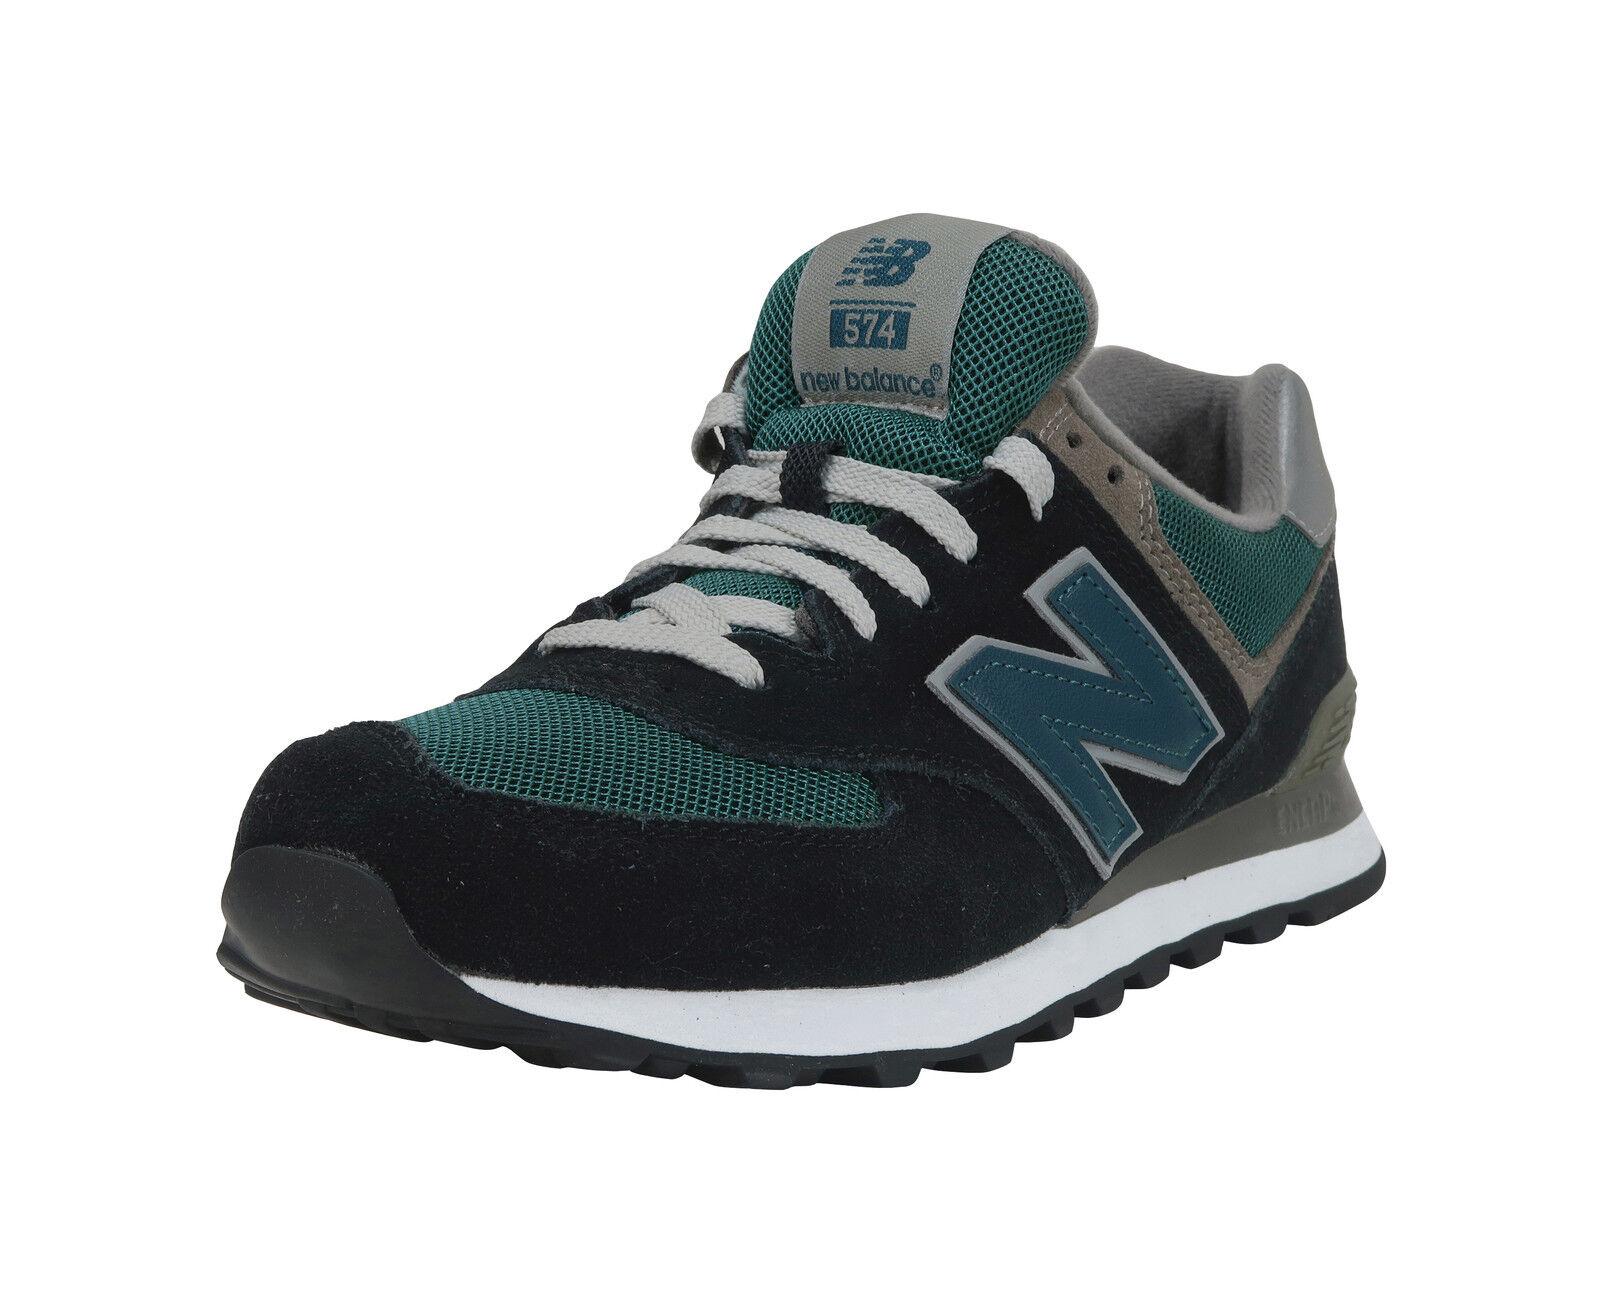 New Balance Shoes Uomo M574 Classic Running  Navy Blue